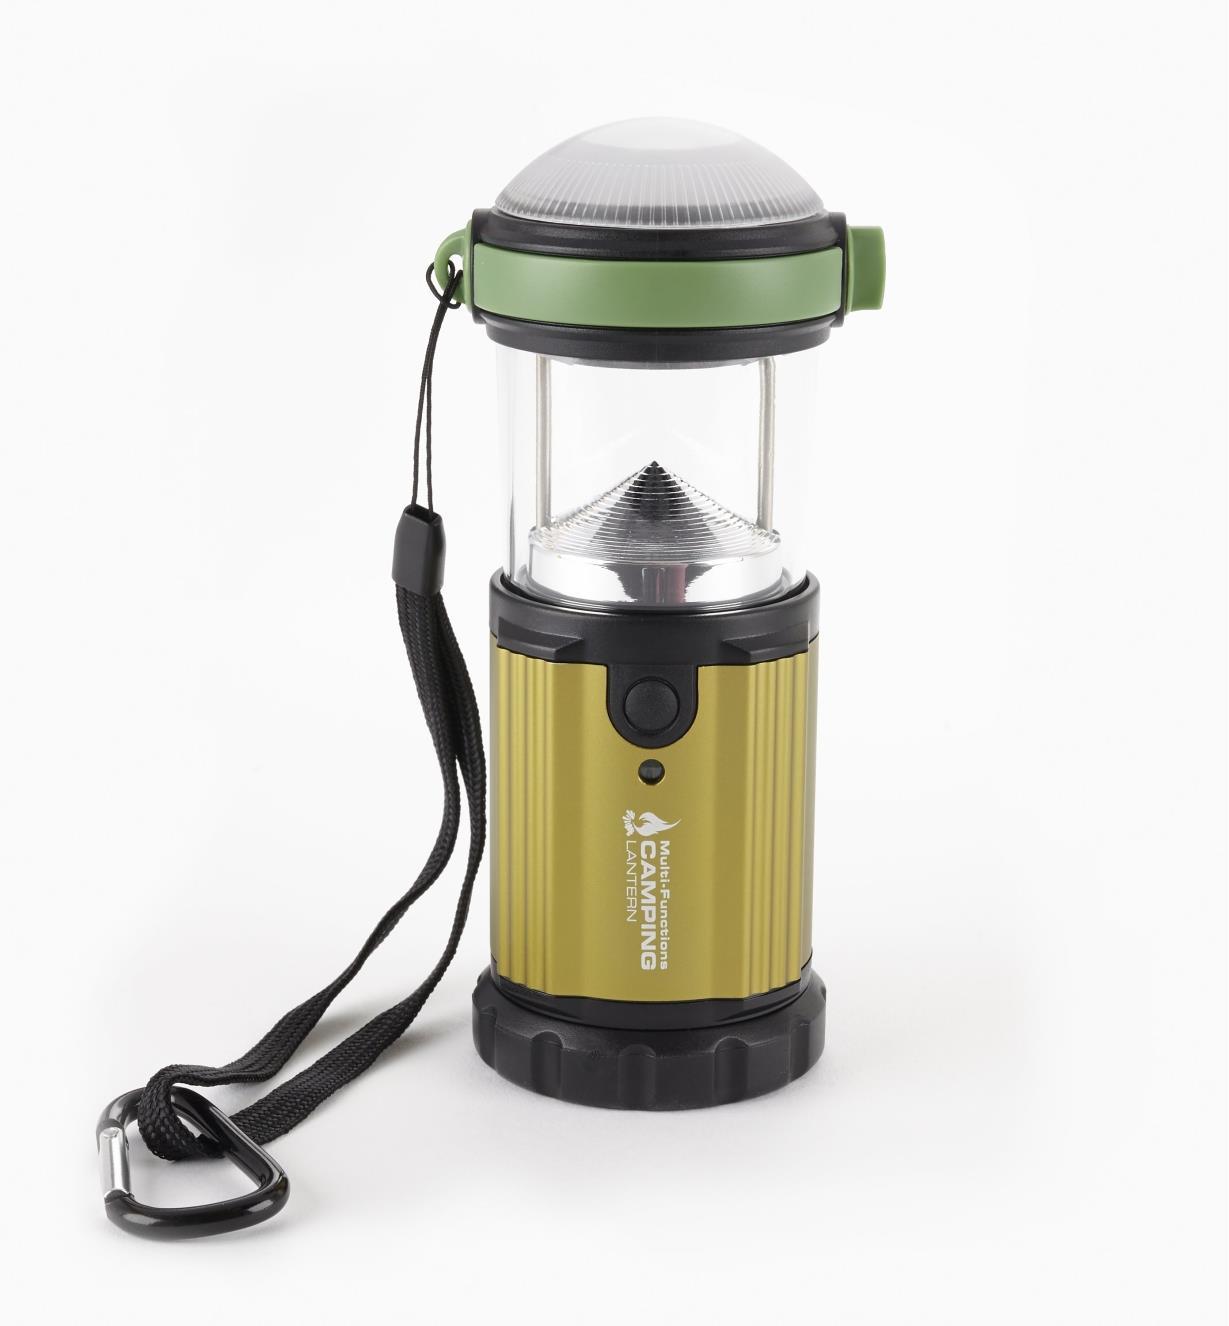 45K1858 - Lanterne de camping à DEL Cree